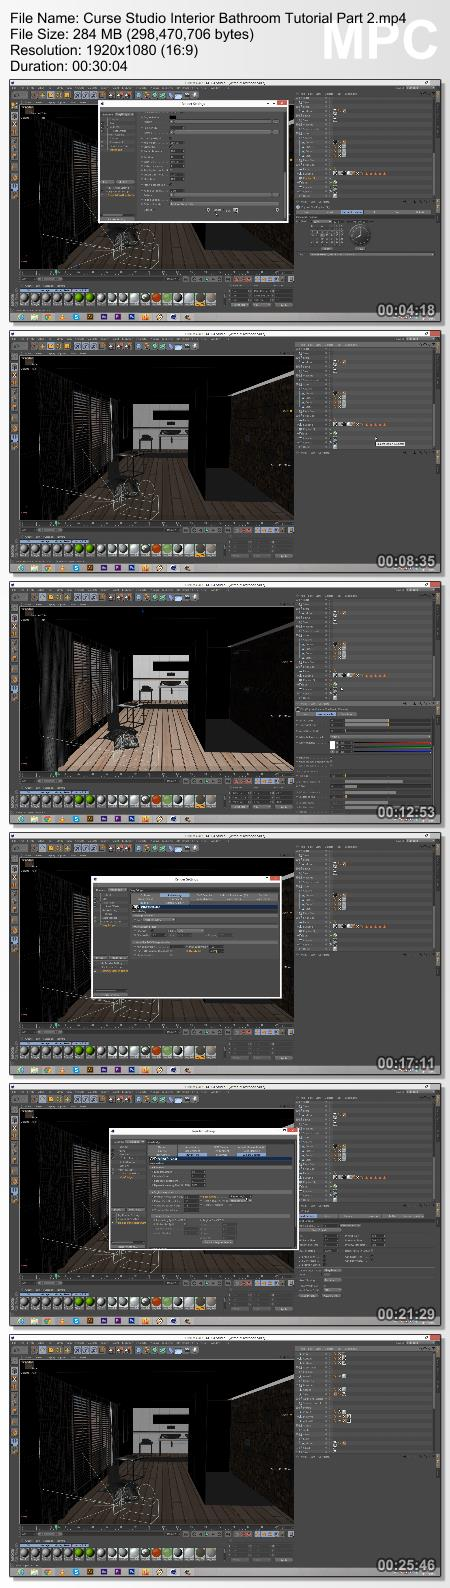 Curse Studio Interior Bathroom Tutorial Vray For C4D - Scene File